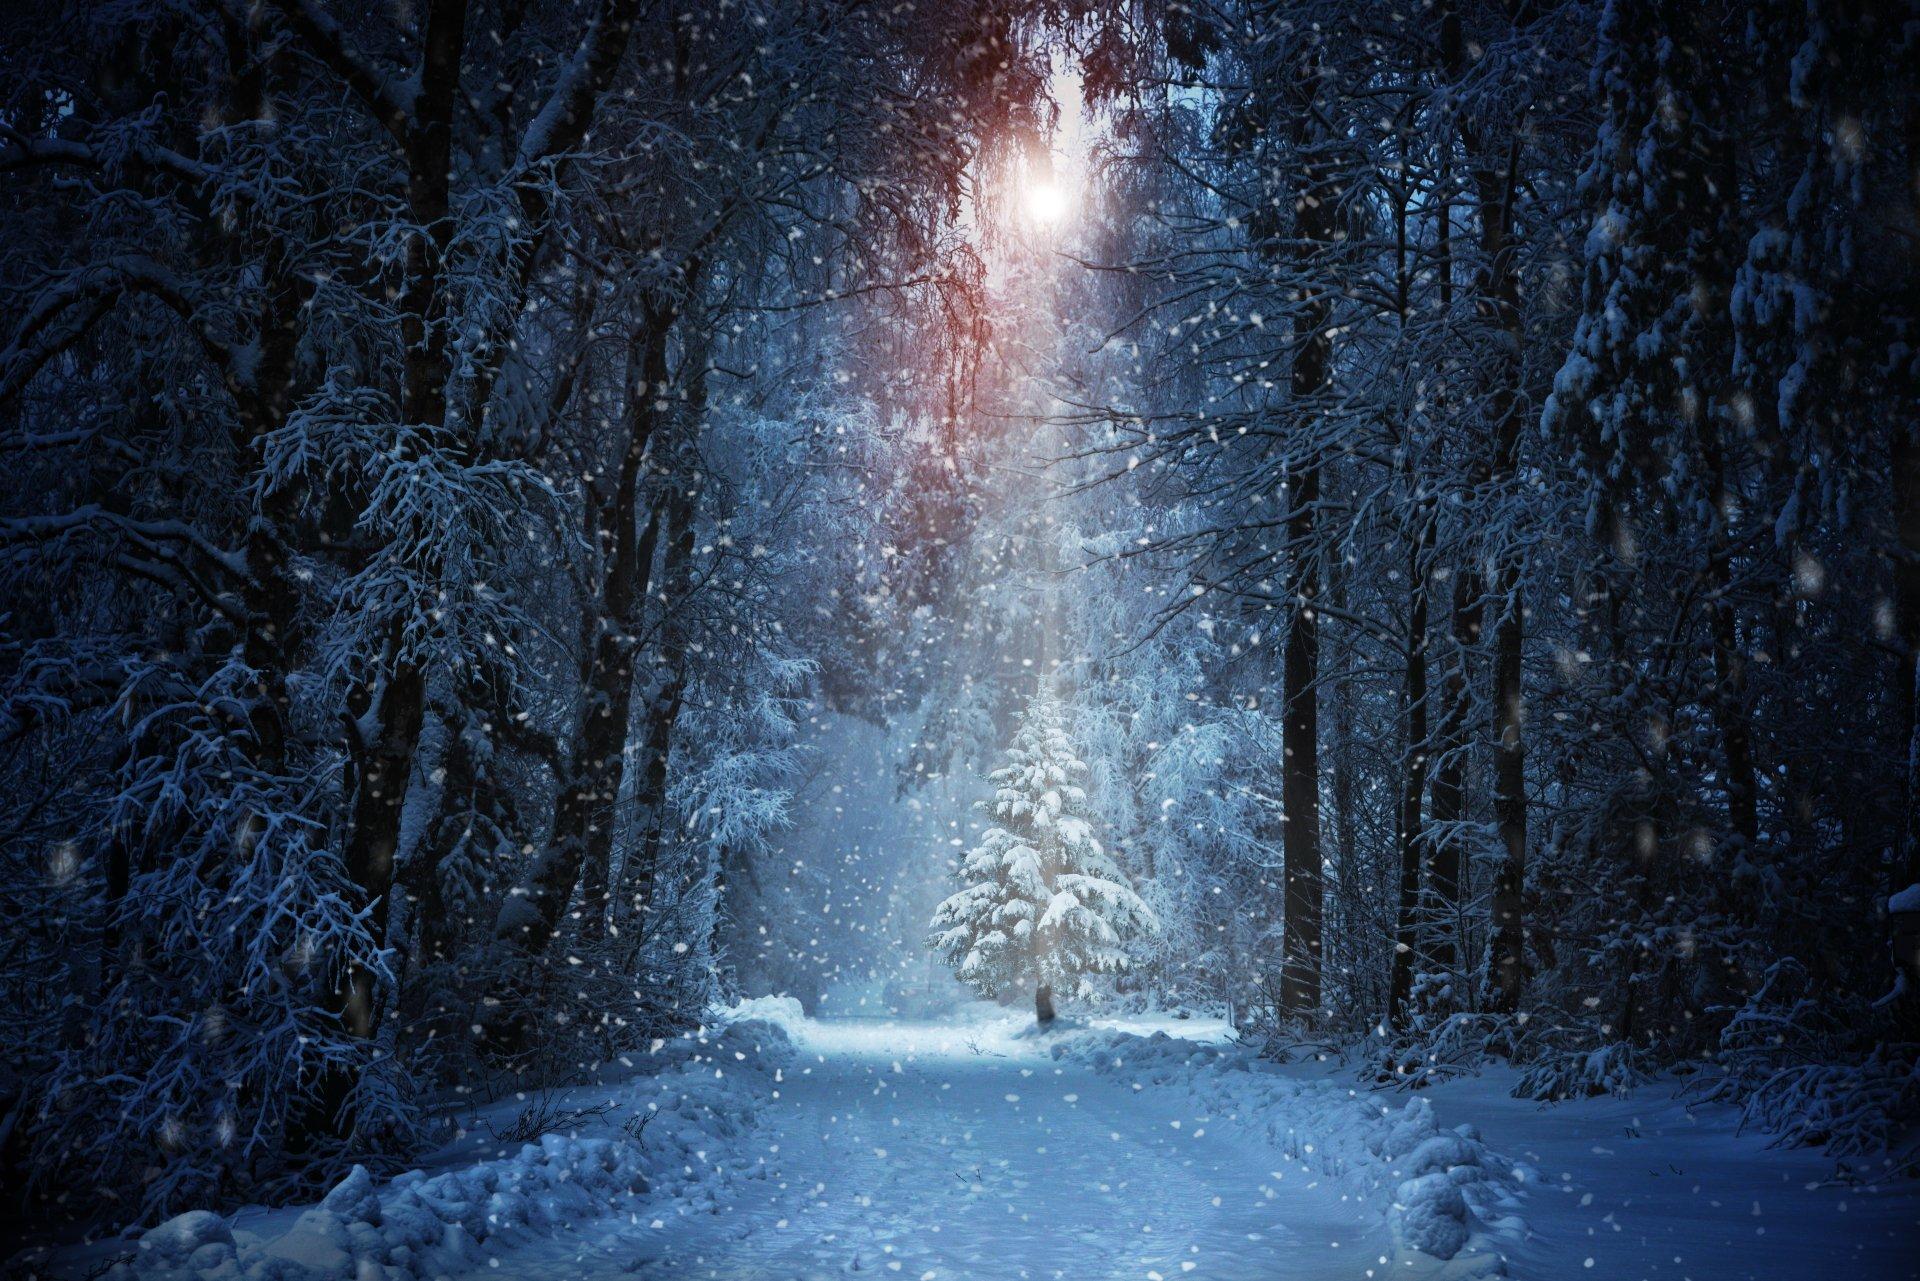 Earth - Winter  Forest Snow Snowfall Sunbeam Path Wallpaper